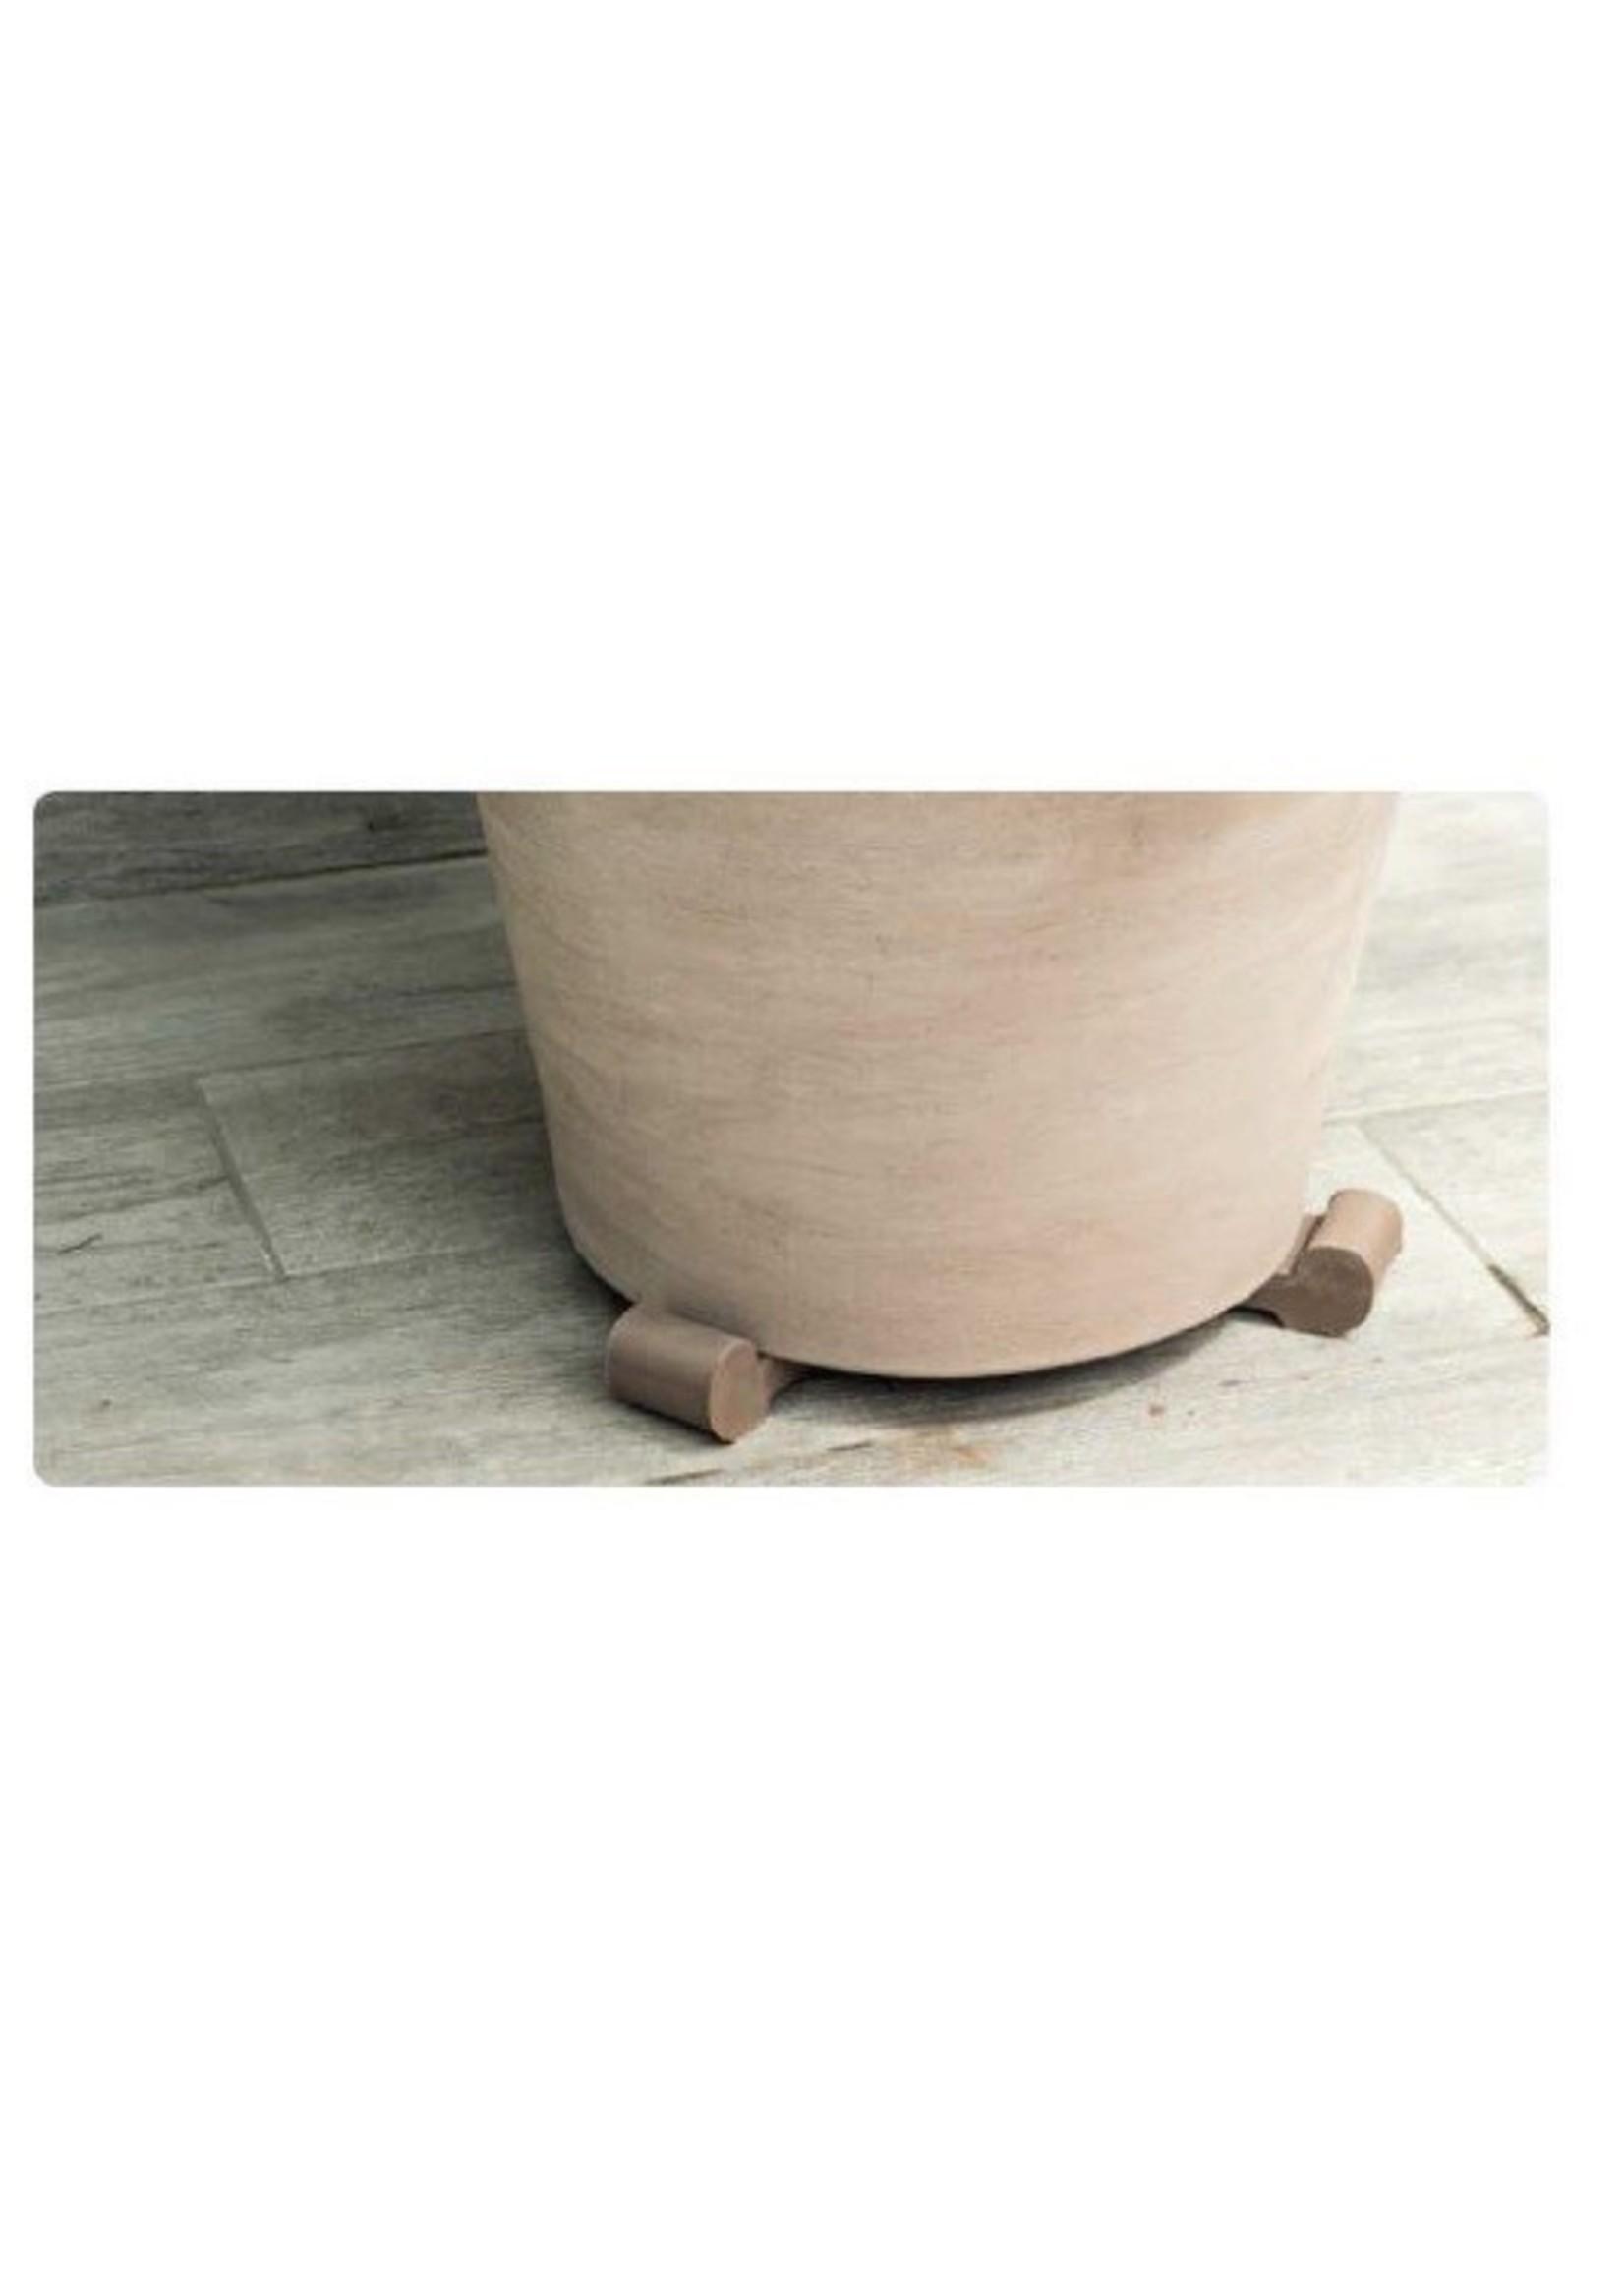 Clay Pot Feet - Graphite